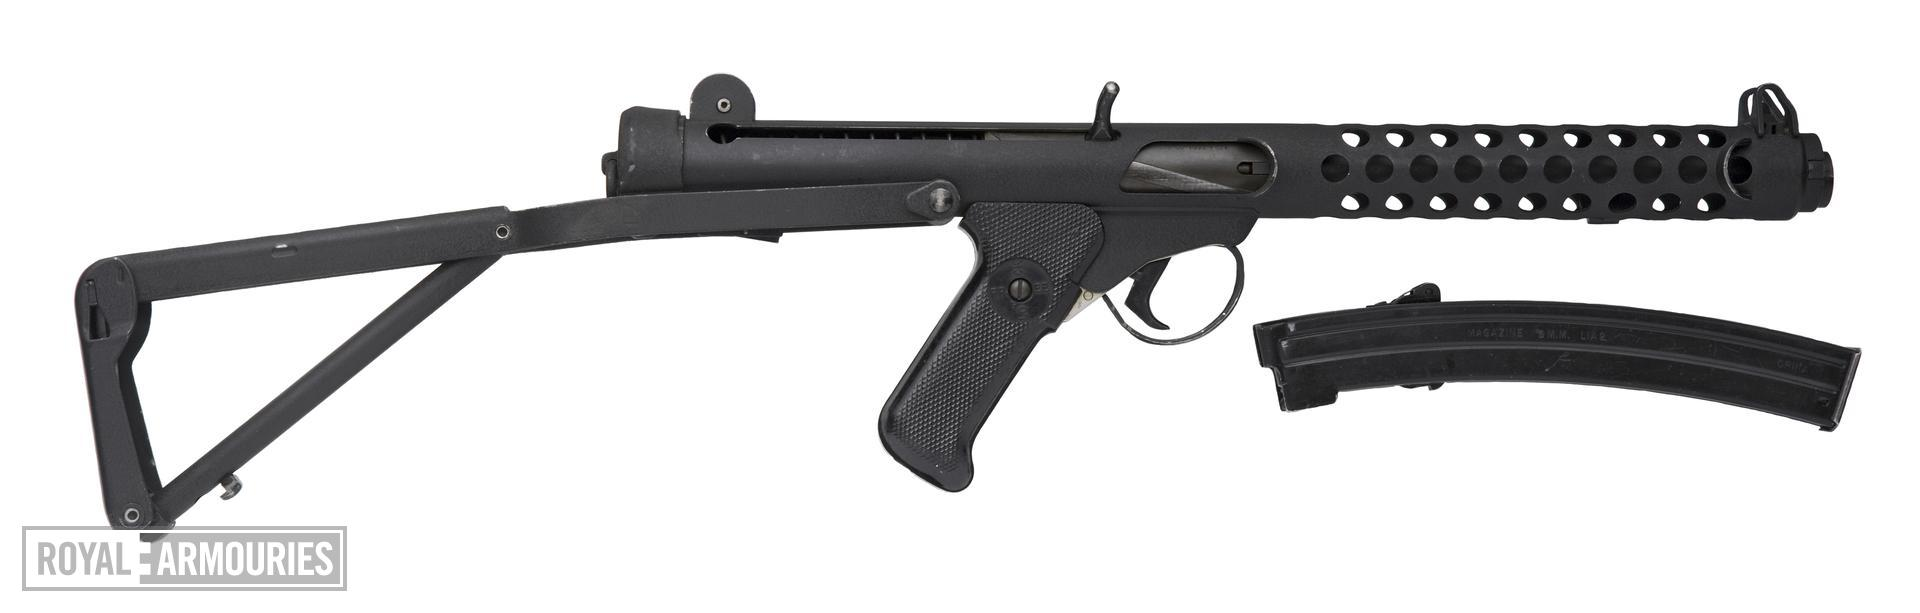 Centrefire automatic submachine gun - Sterling Mk.4 (L2A3) commercial model